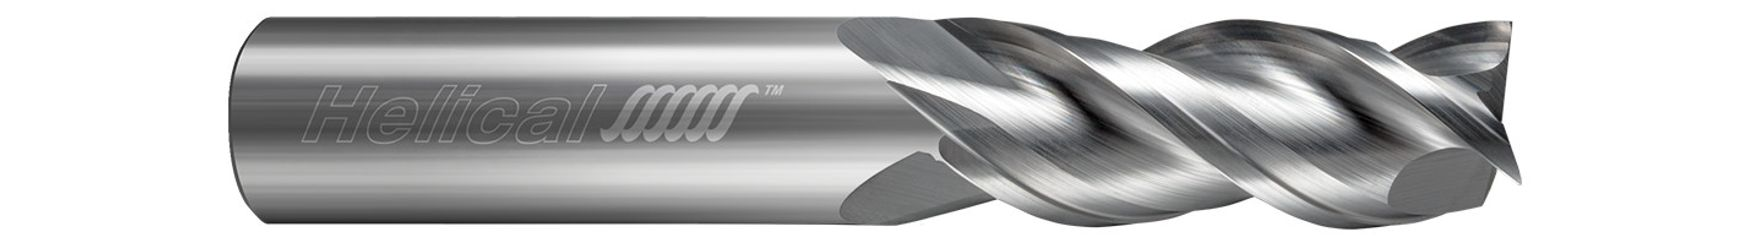 tool-details-48395